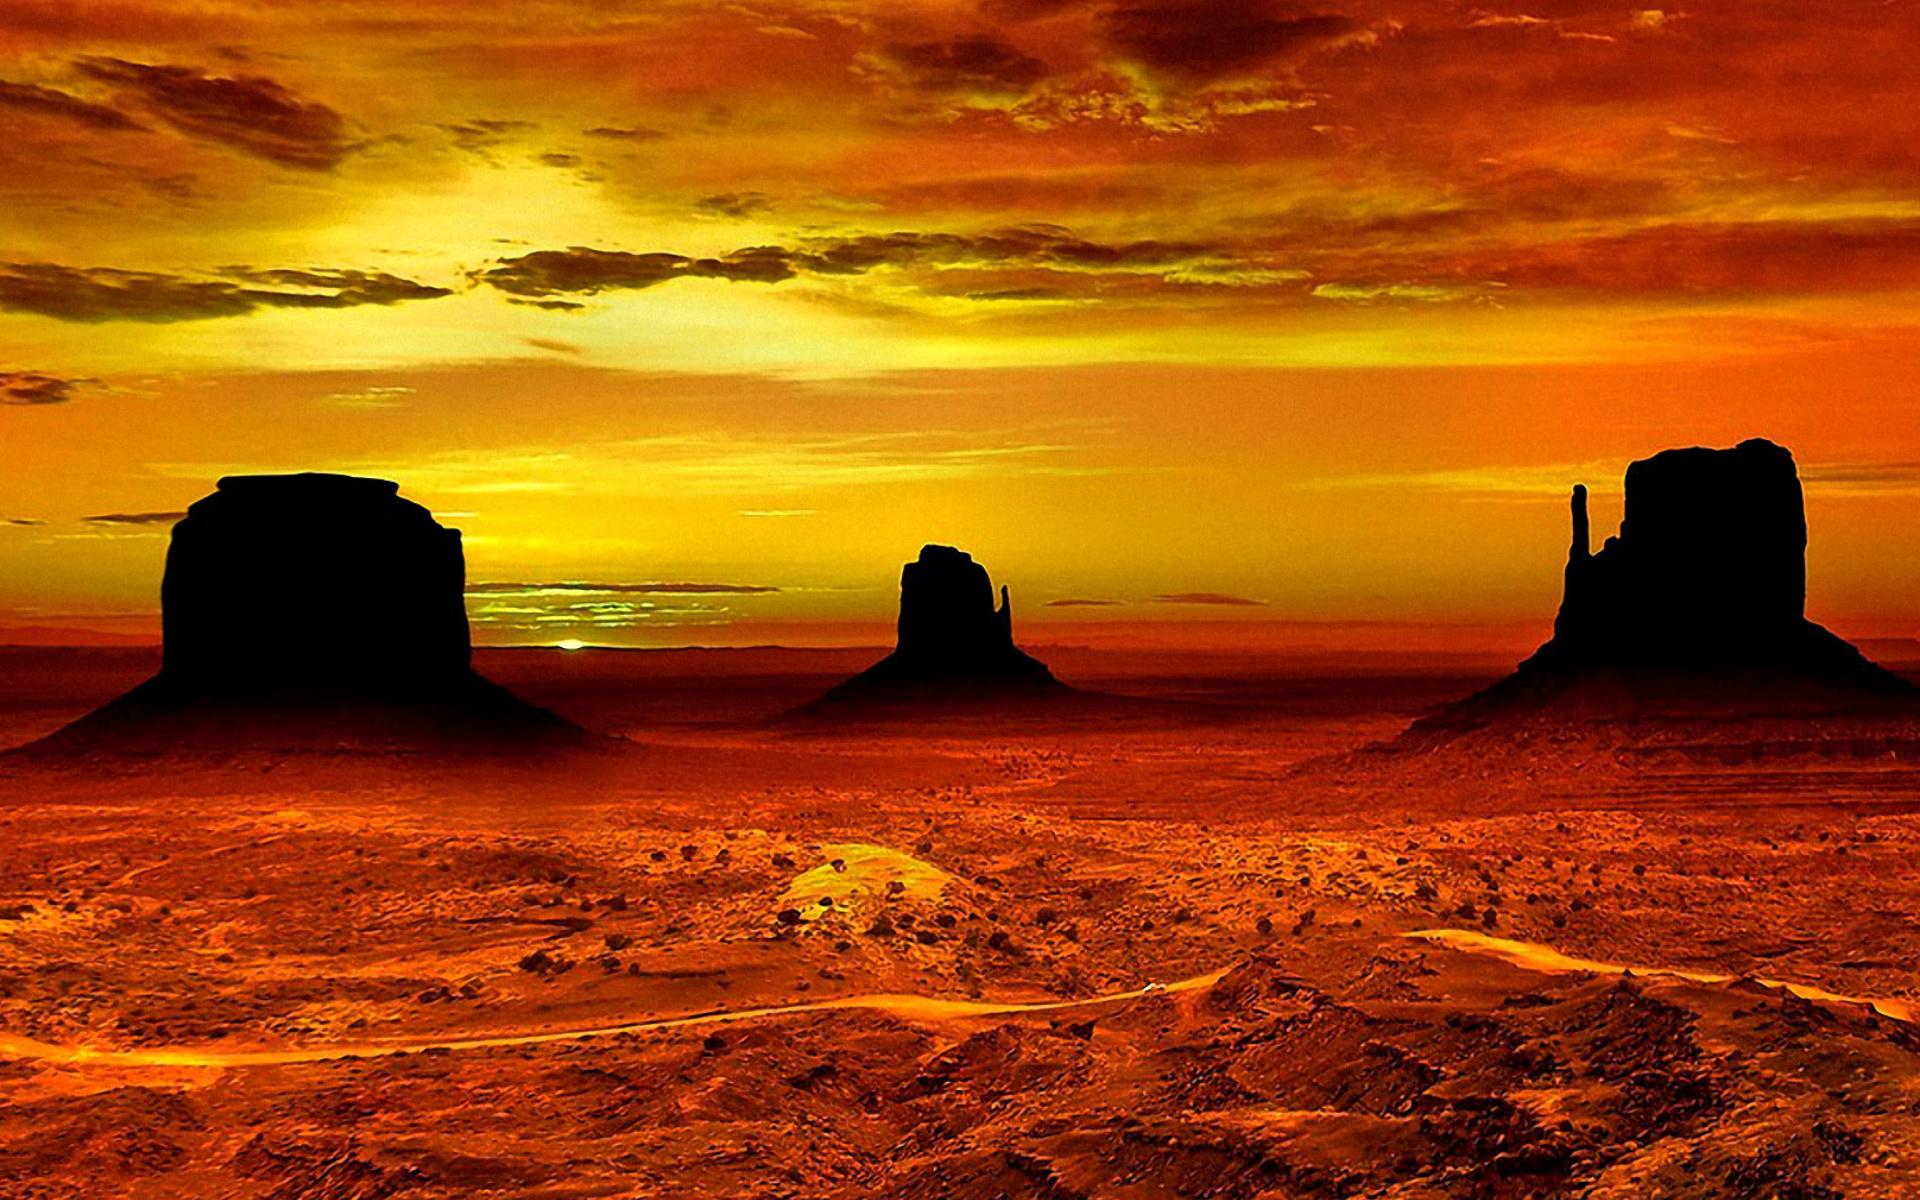 Monument Valley Navajo Tribal Park In Arizona Wallpaper